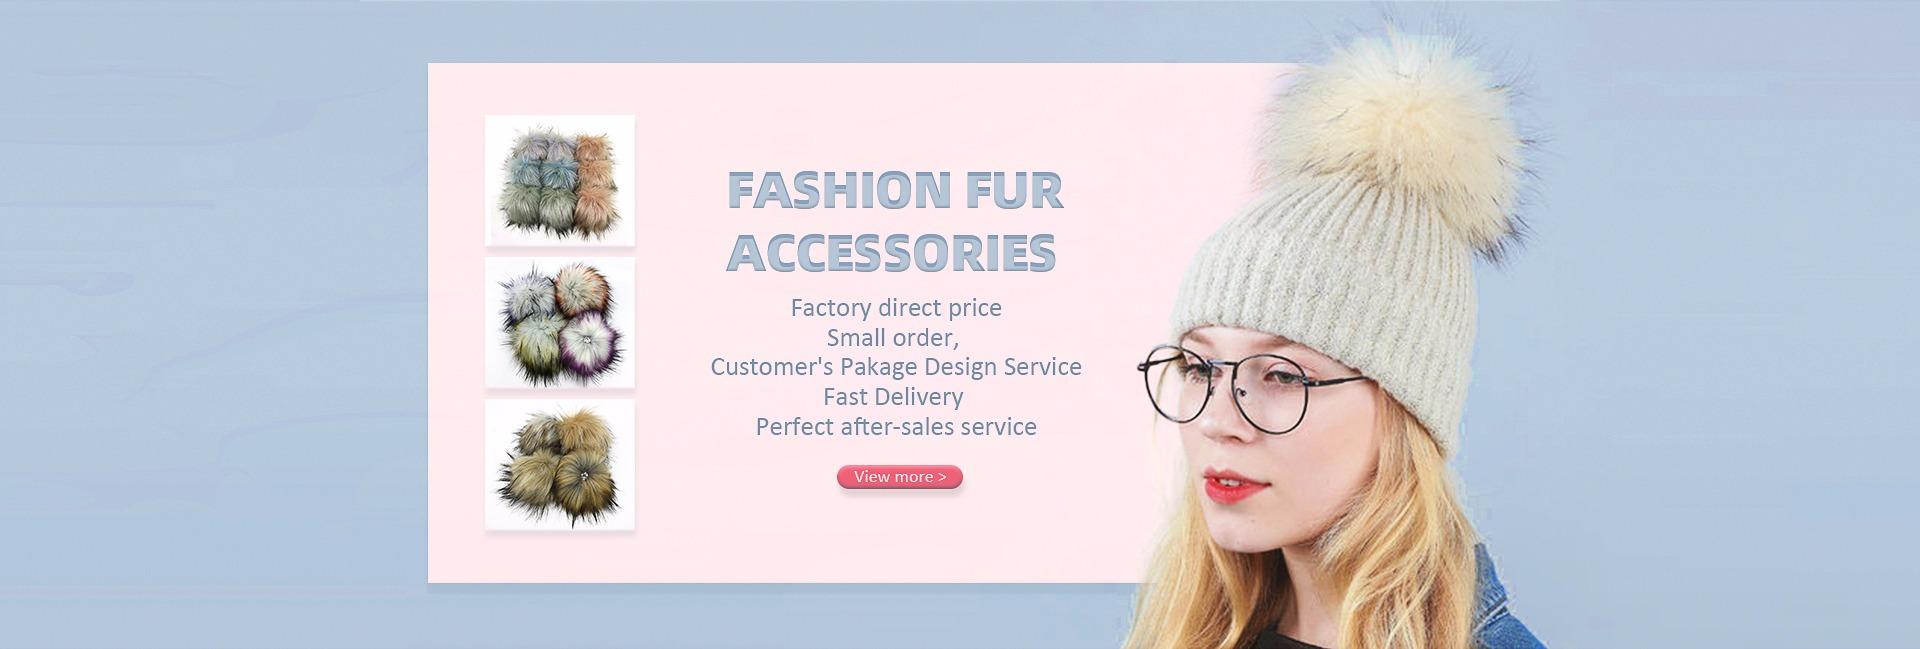 afb74dfee Shenzhen Landful Textile & Trading Co., Ltd. - faux fur pompom, faux ...